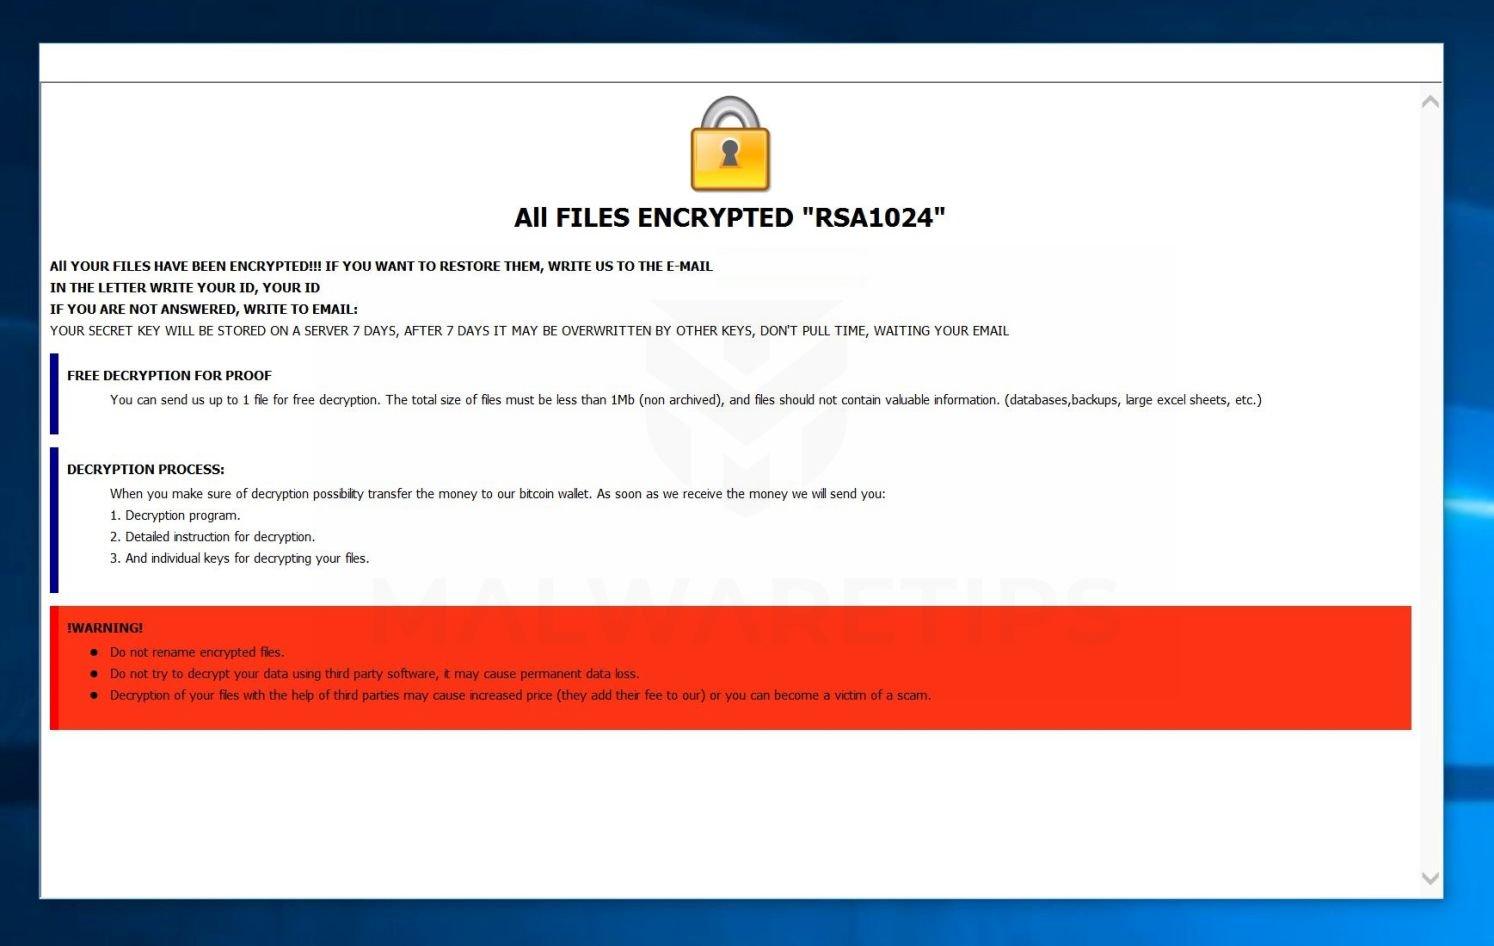 Image: [hccapx@protonmail.com].hccapx ransomware